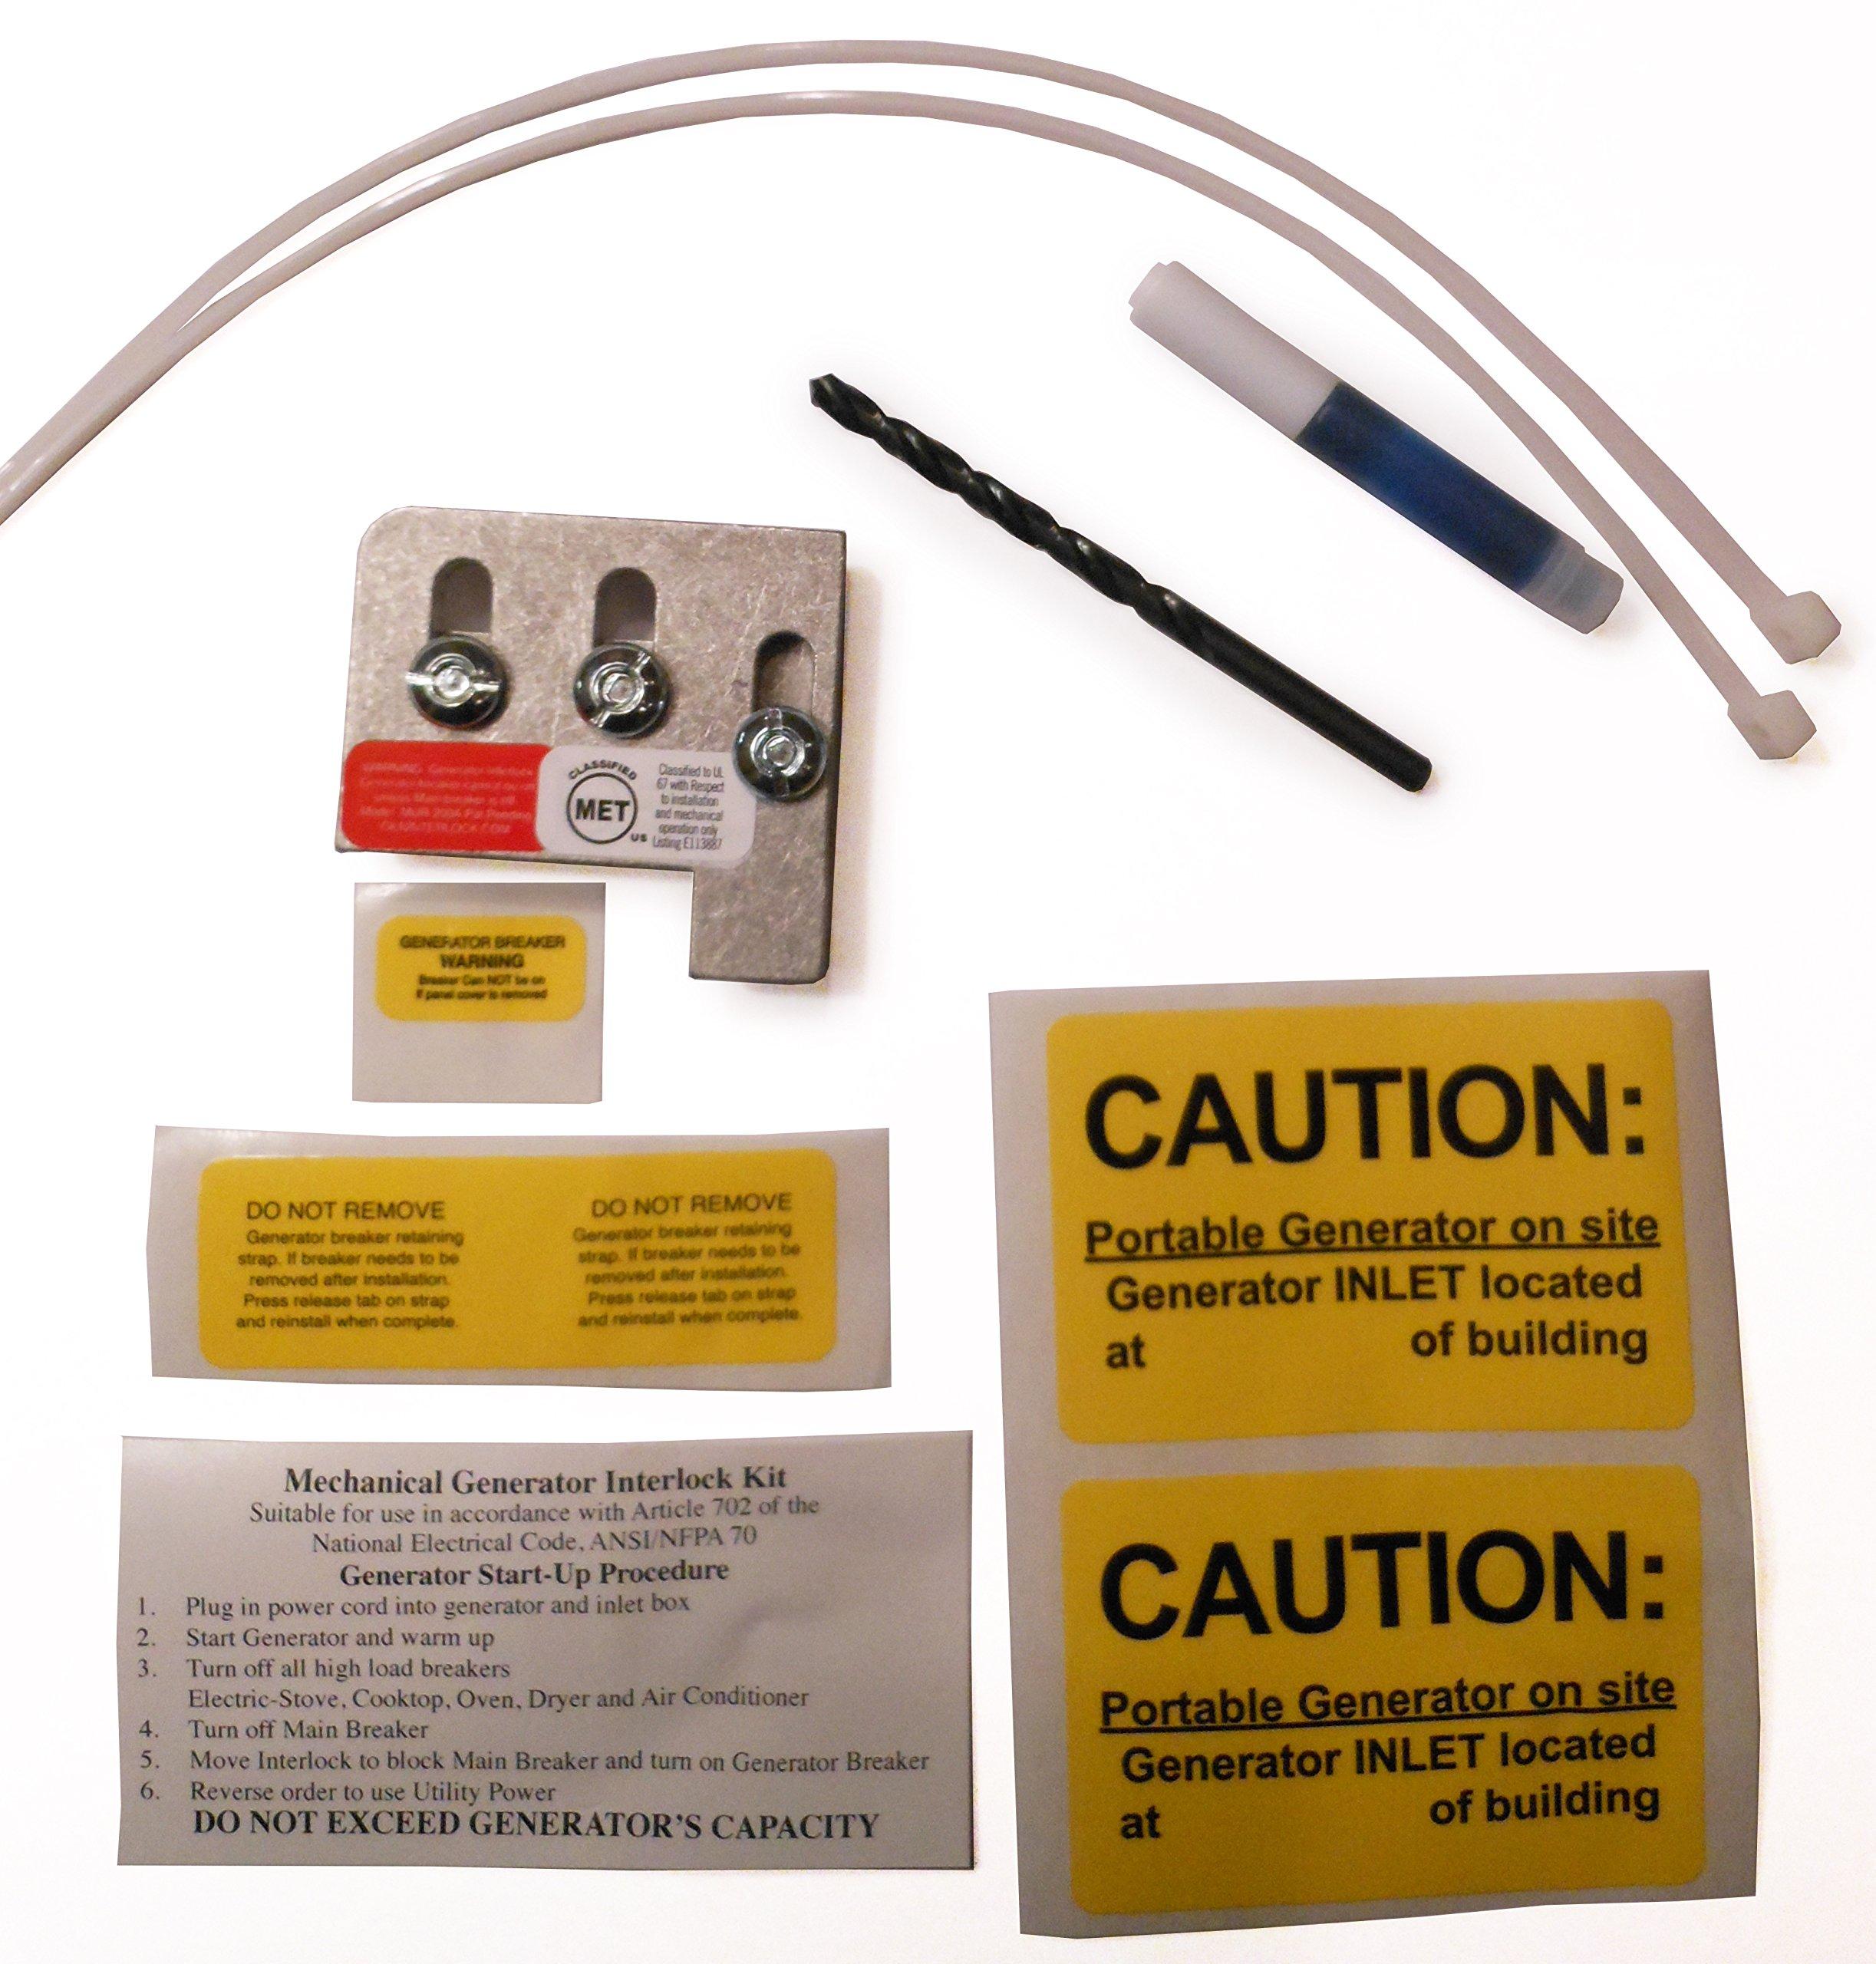 Automotive Fuse Box Generates 20 Amps Of Electrical Power Wiring Headphones Generator Interlock Amazon Commur 200a Murray Or Siemens Kit 150 Amp 200